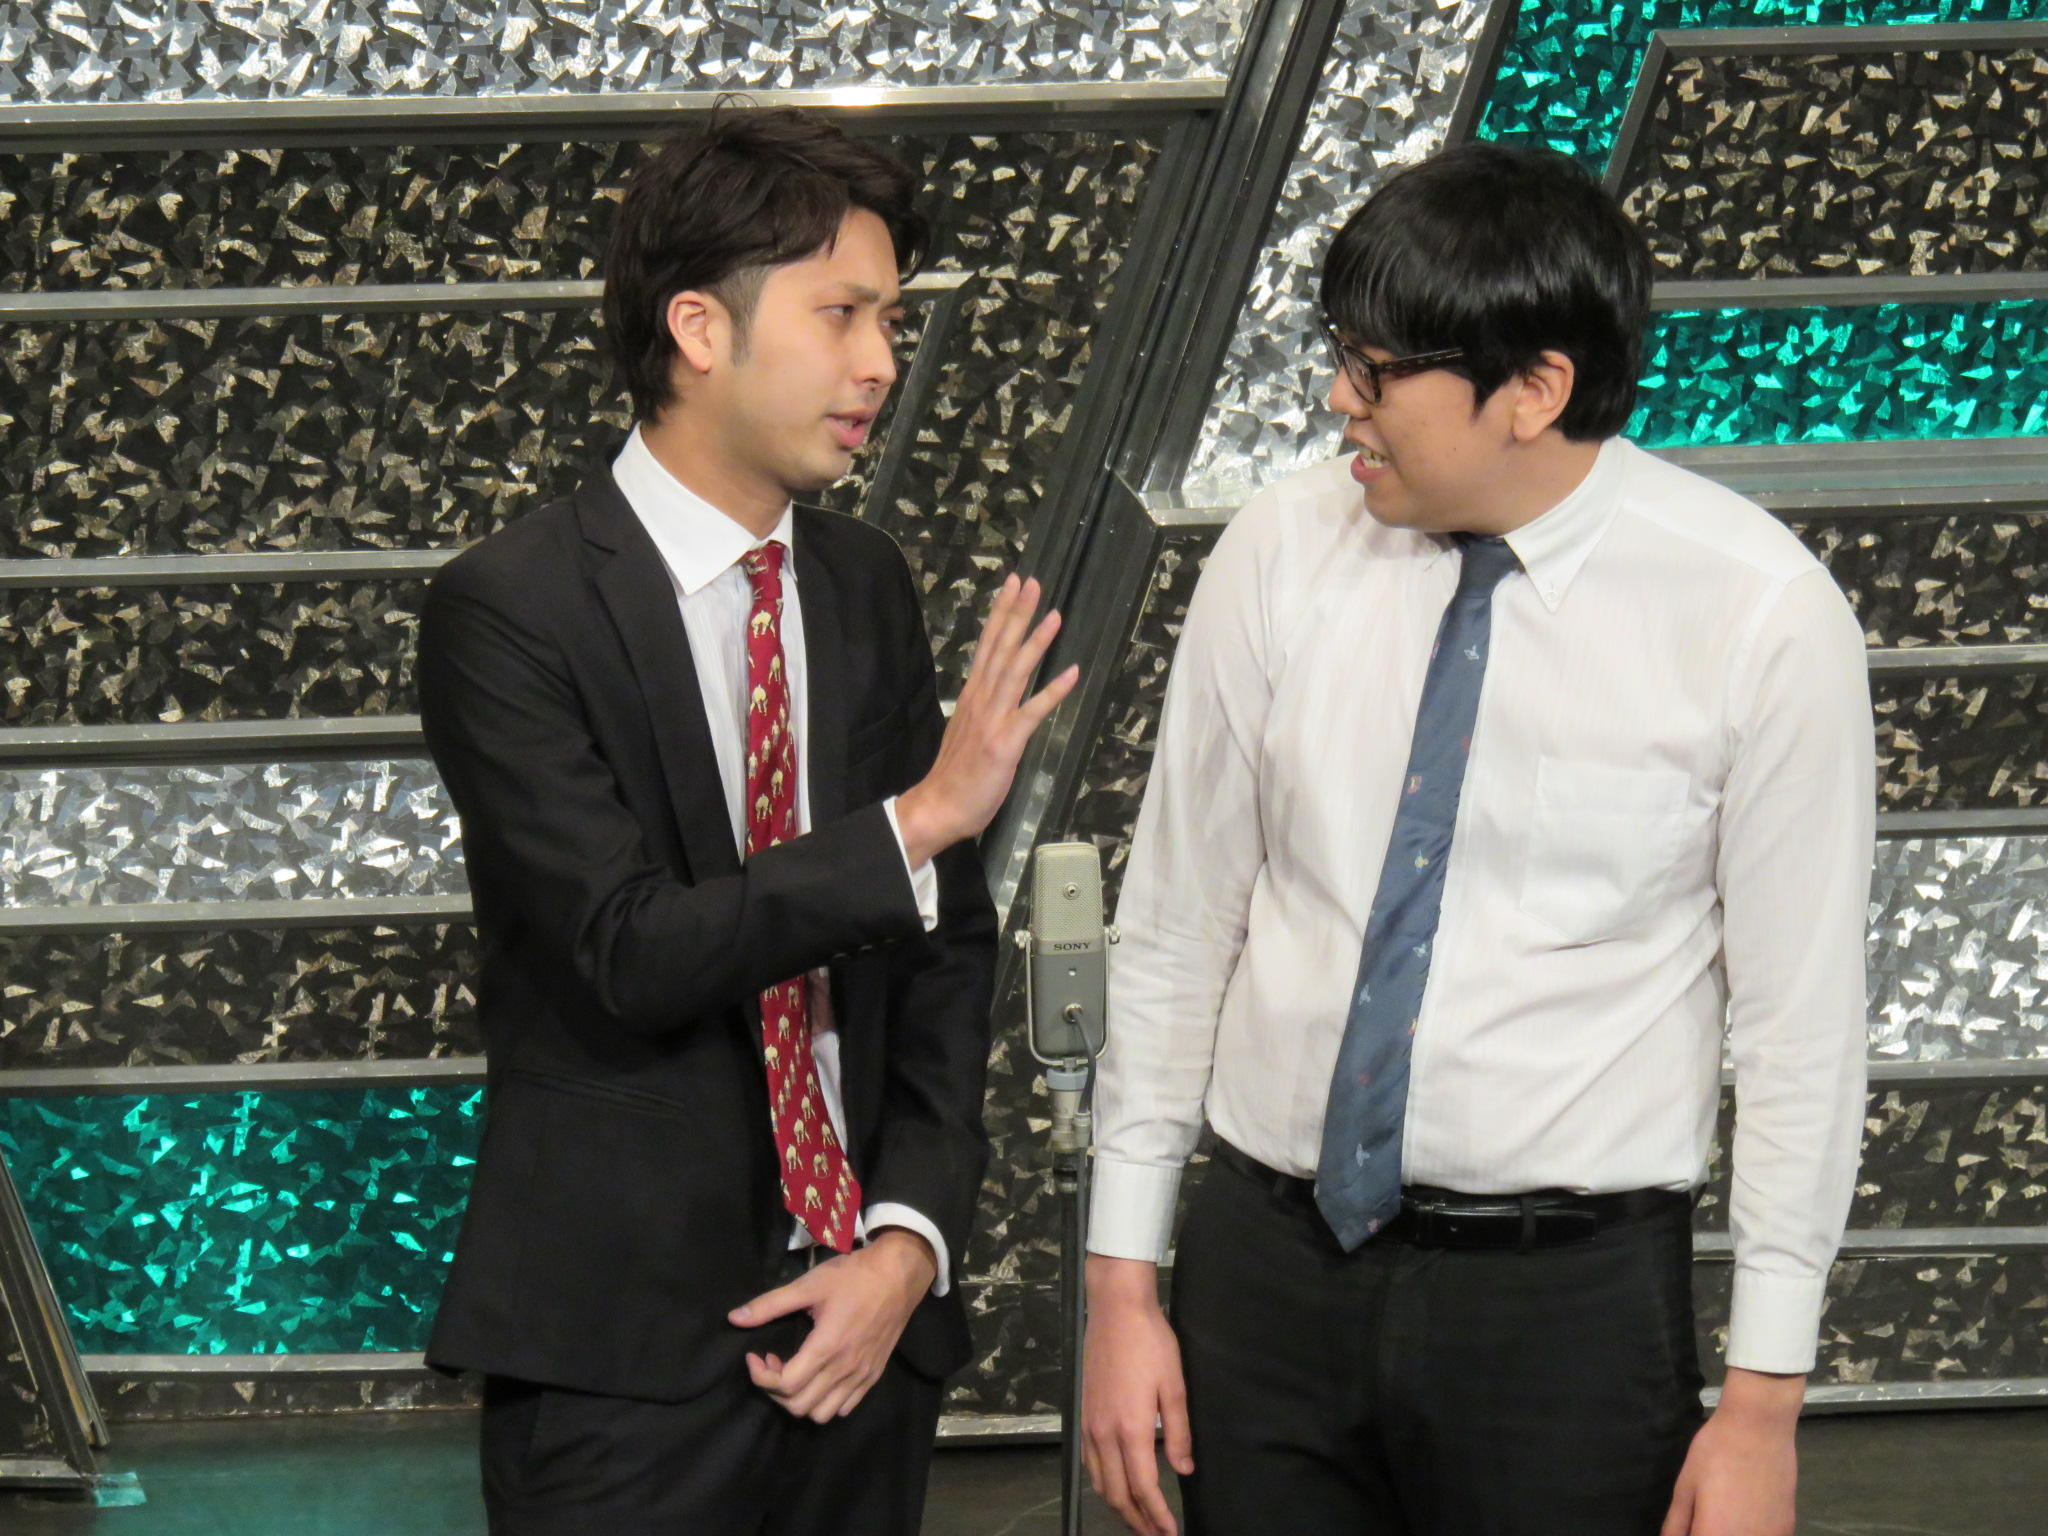 http://news.yoshimoto.co.jp/20160229144017-f452dcda896dd81f7d0452b484f6ee4611f84b1e.jpg